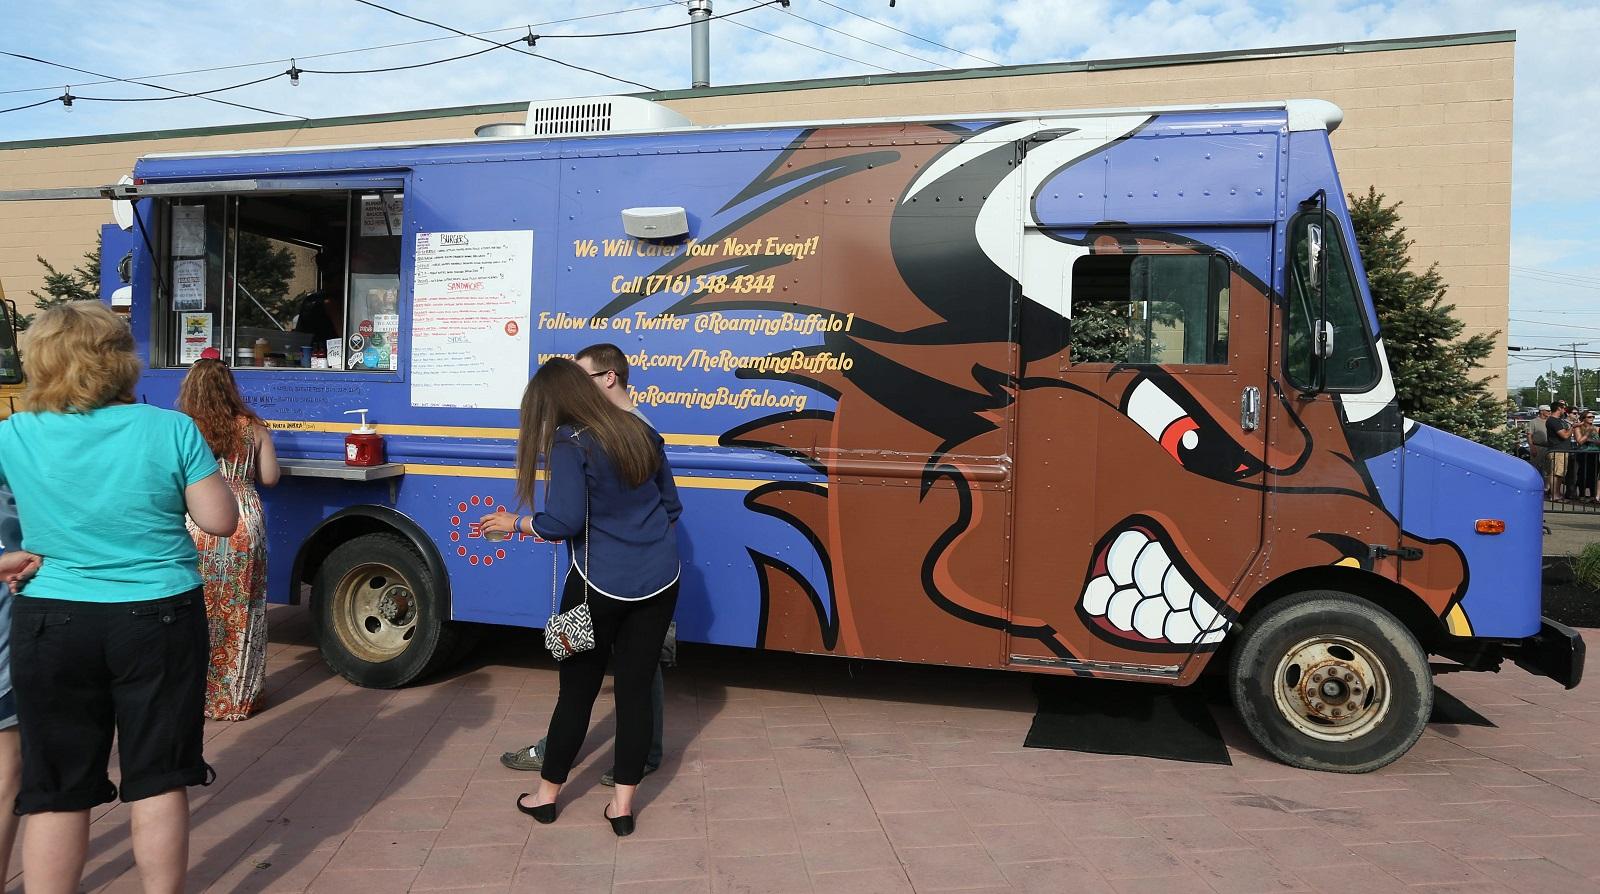 Roaming Buffalo food truck. (Sharon Cantillon/Buffalo News)